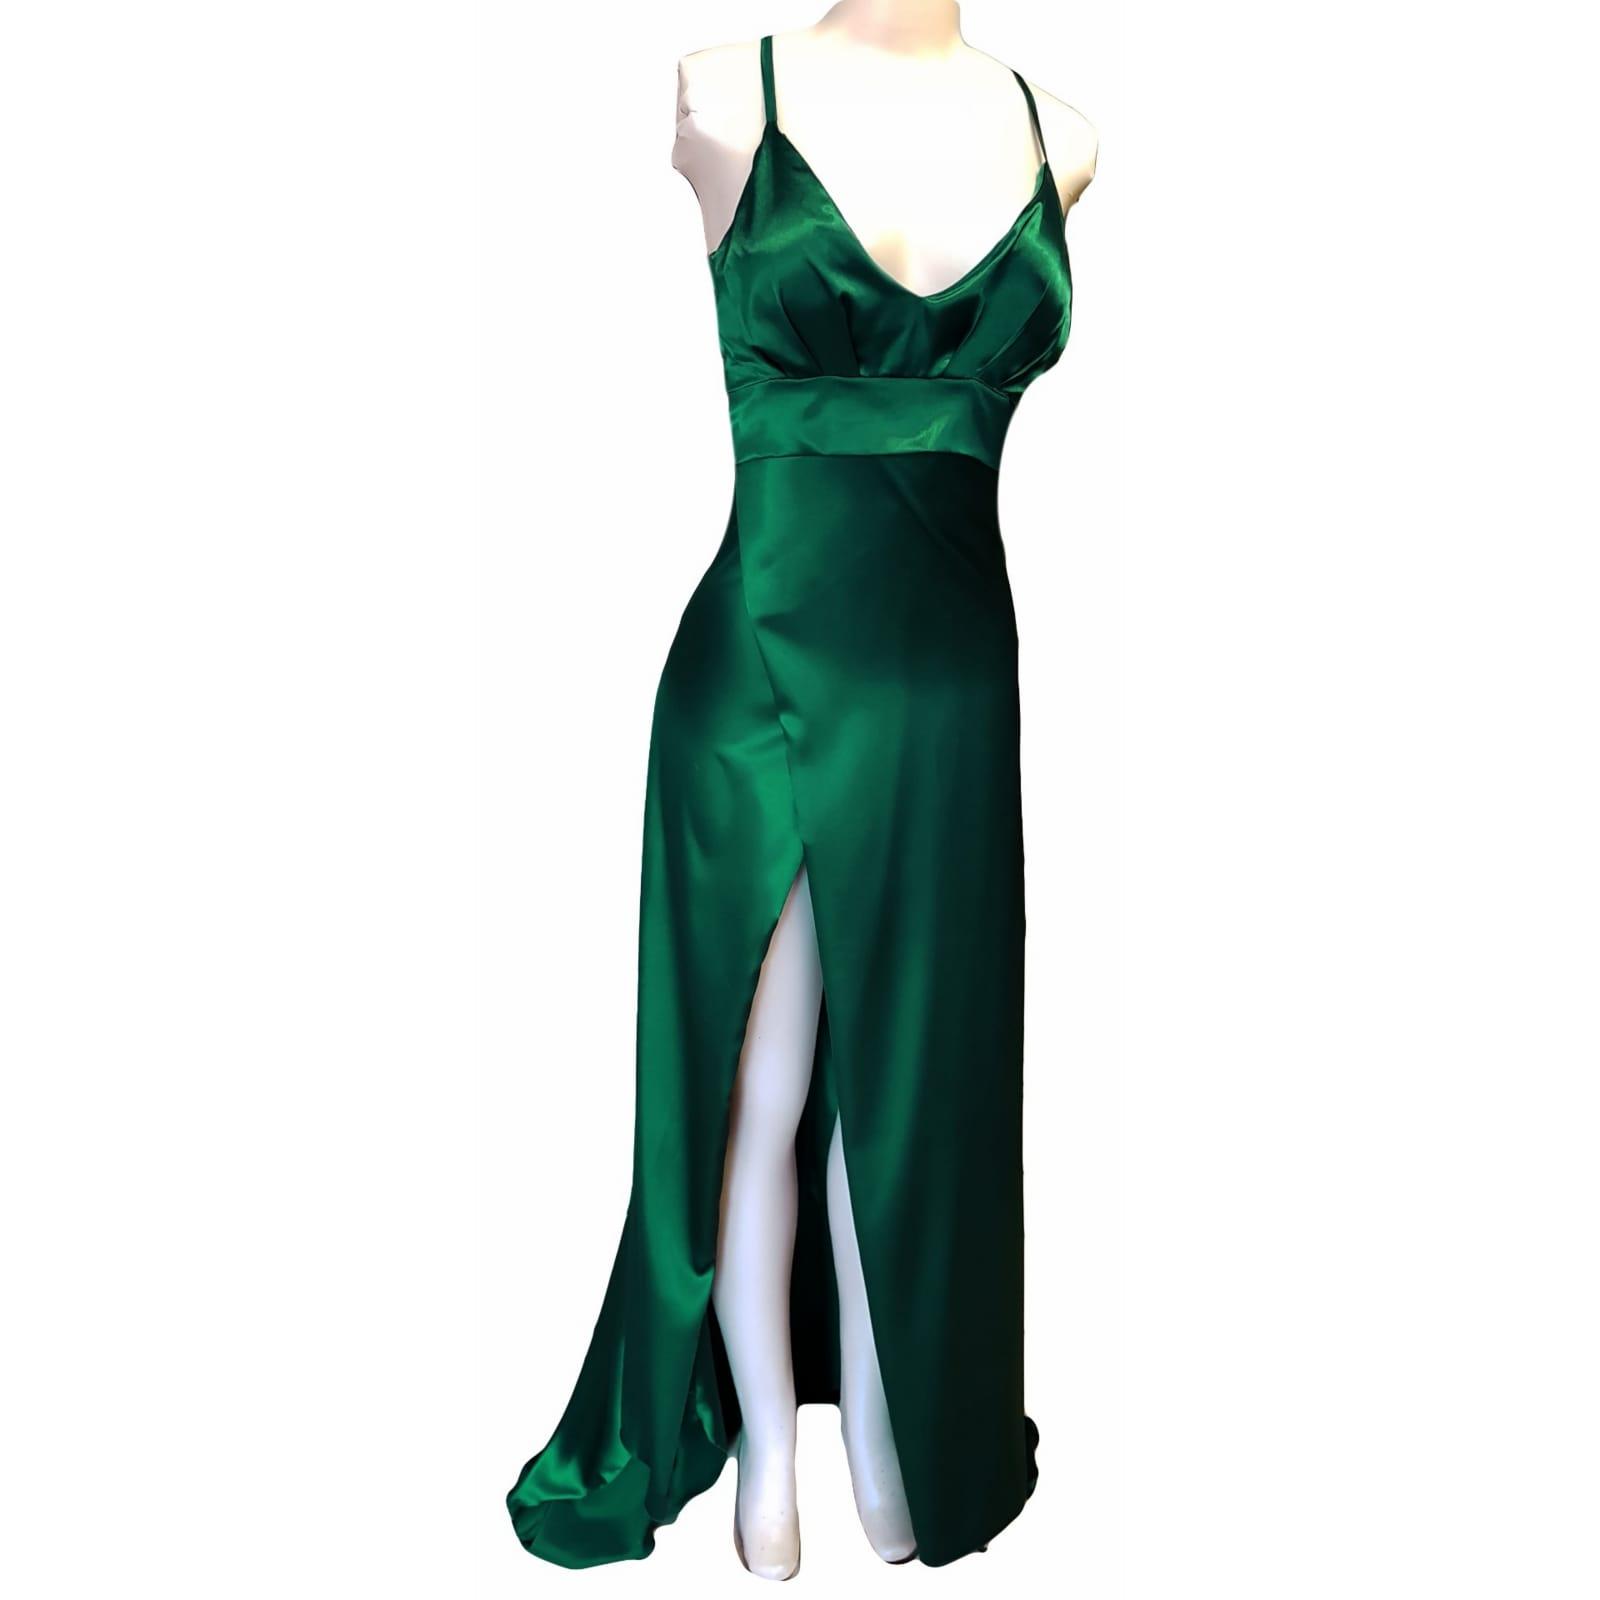 Emerald green long satin prom dress 5 emerald green long satin prom dress. With a high crossed slit and a train.